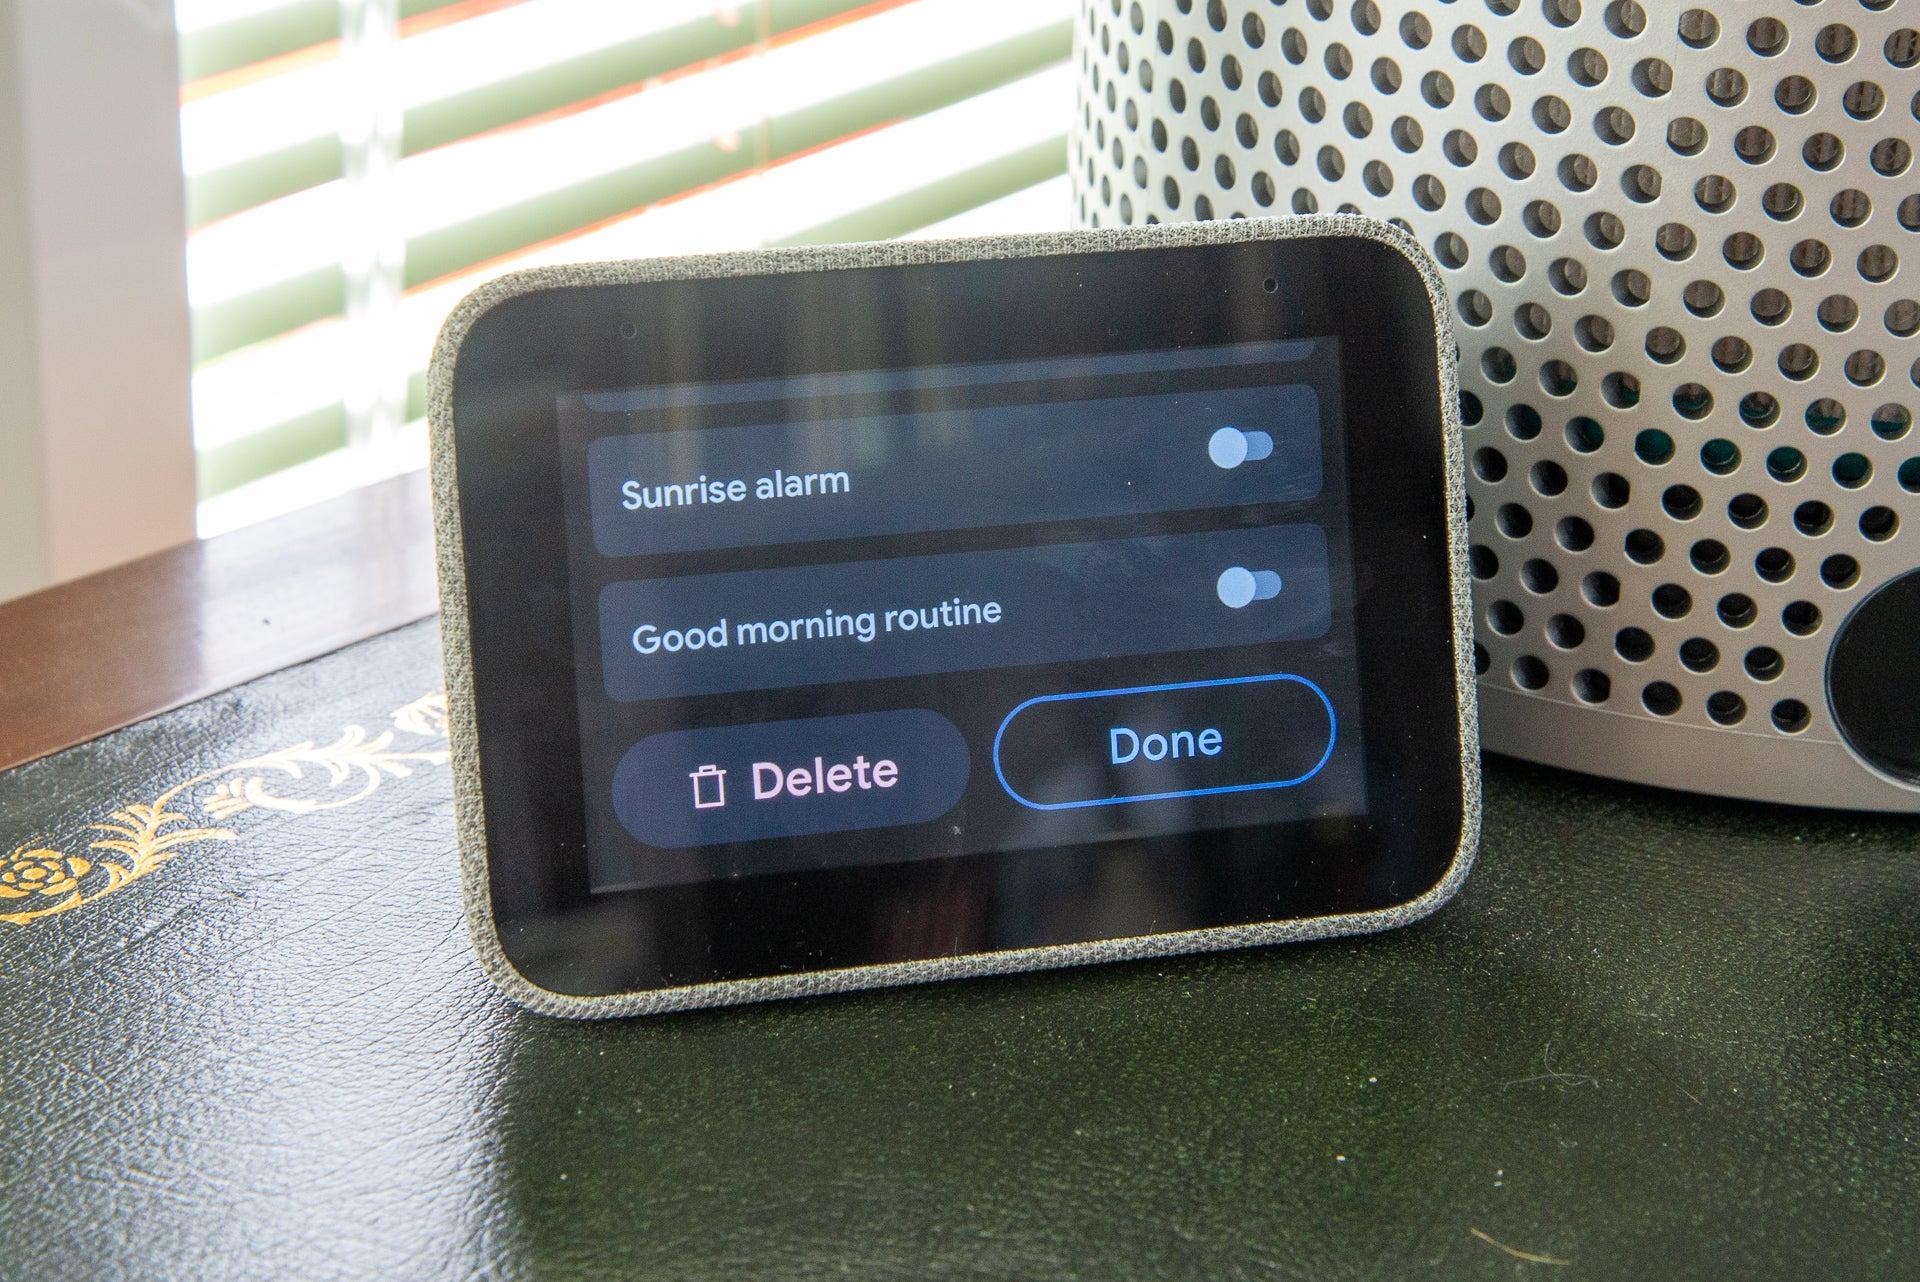 Lenovo Smart Clock alarm options